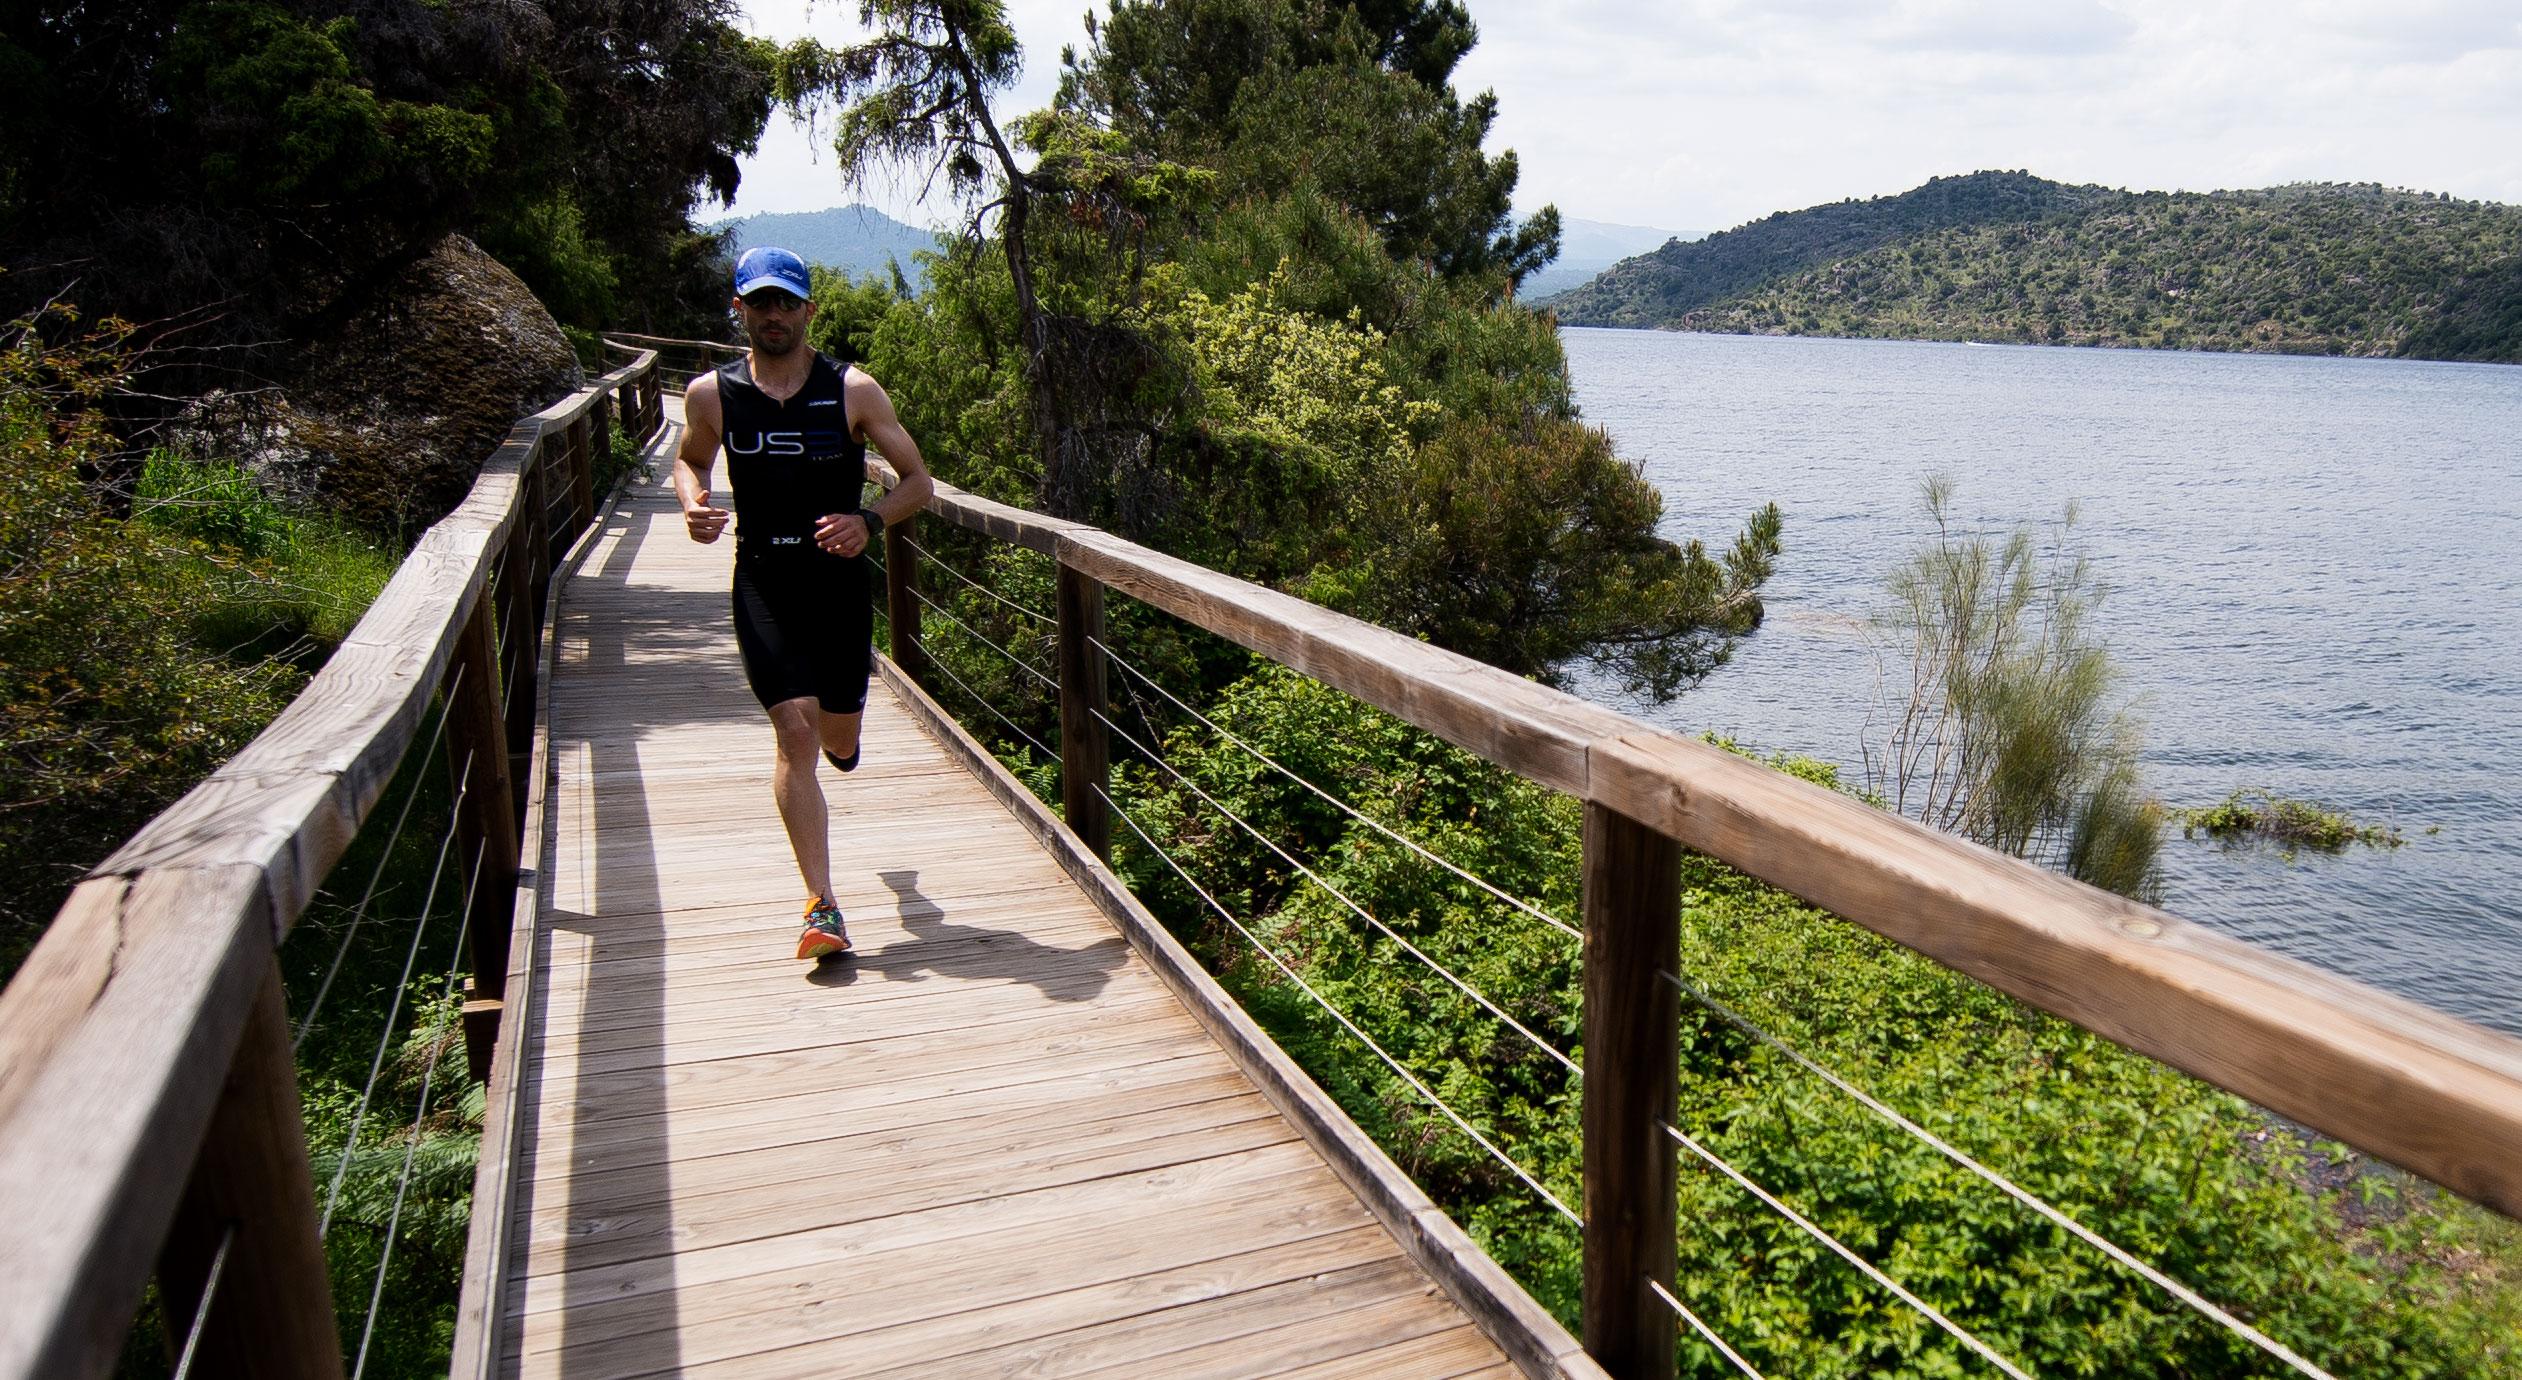 us3-triathlon-team-javi-running